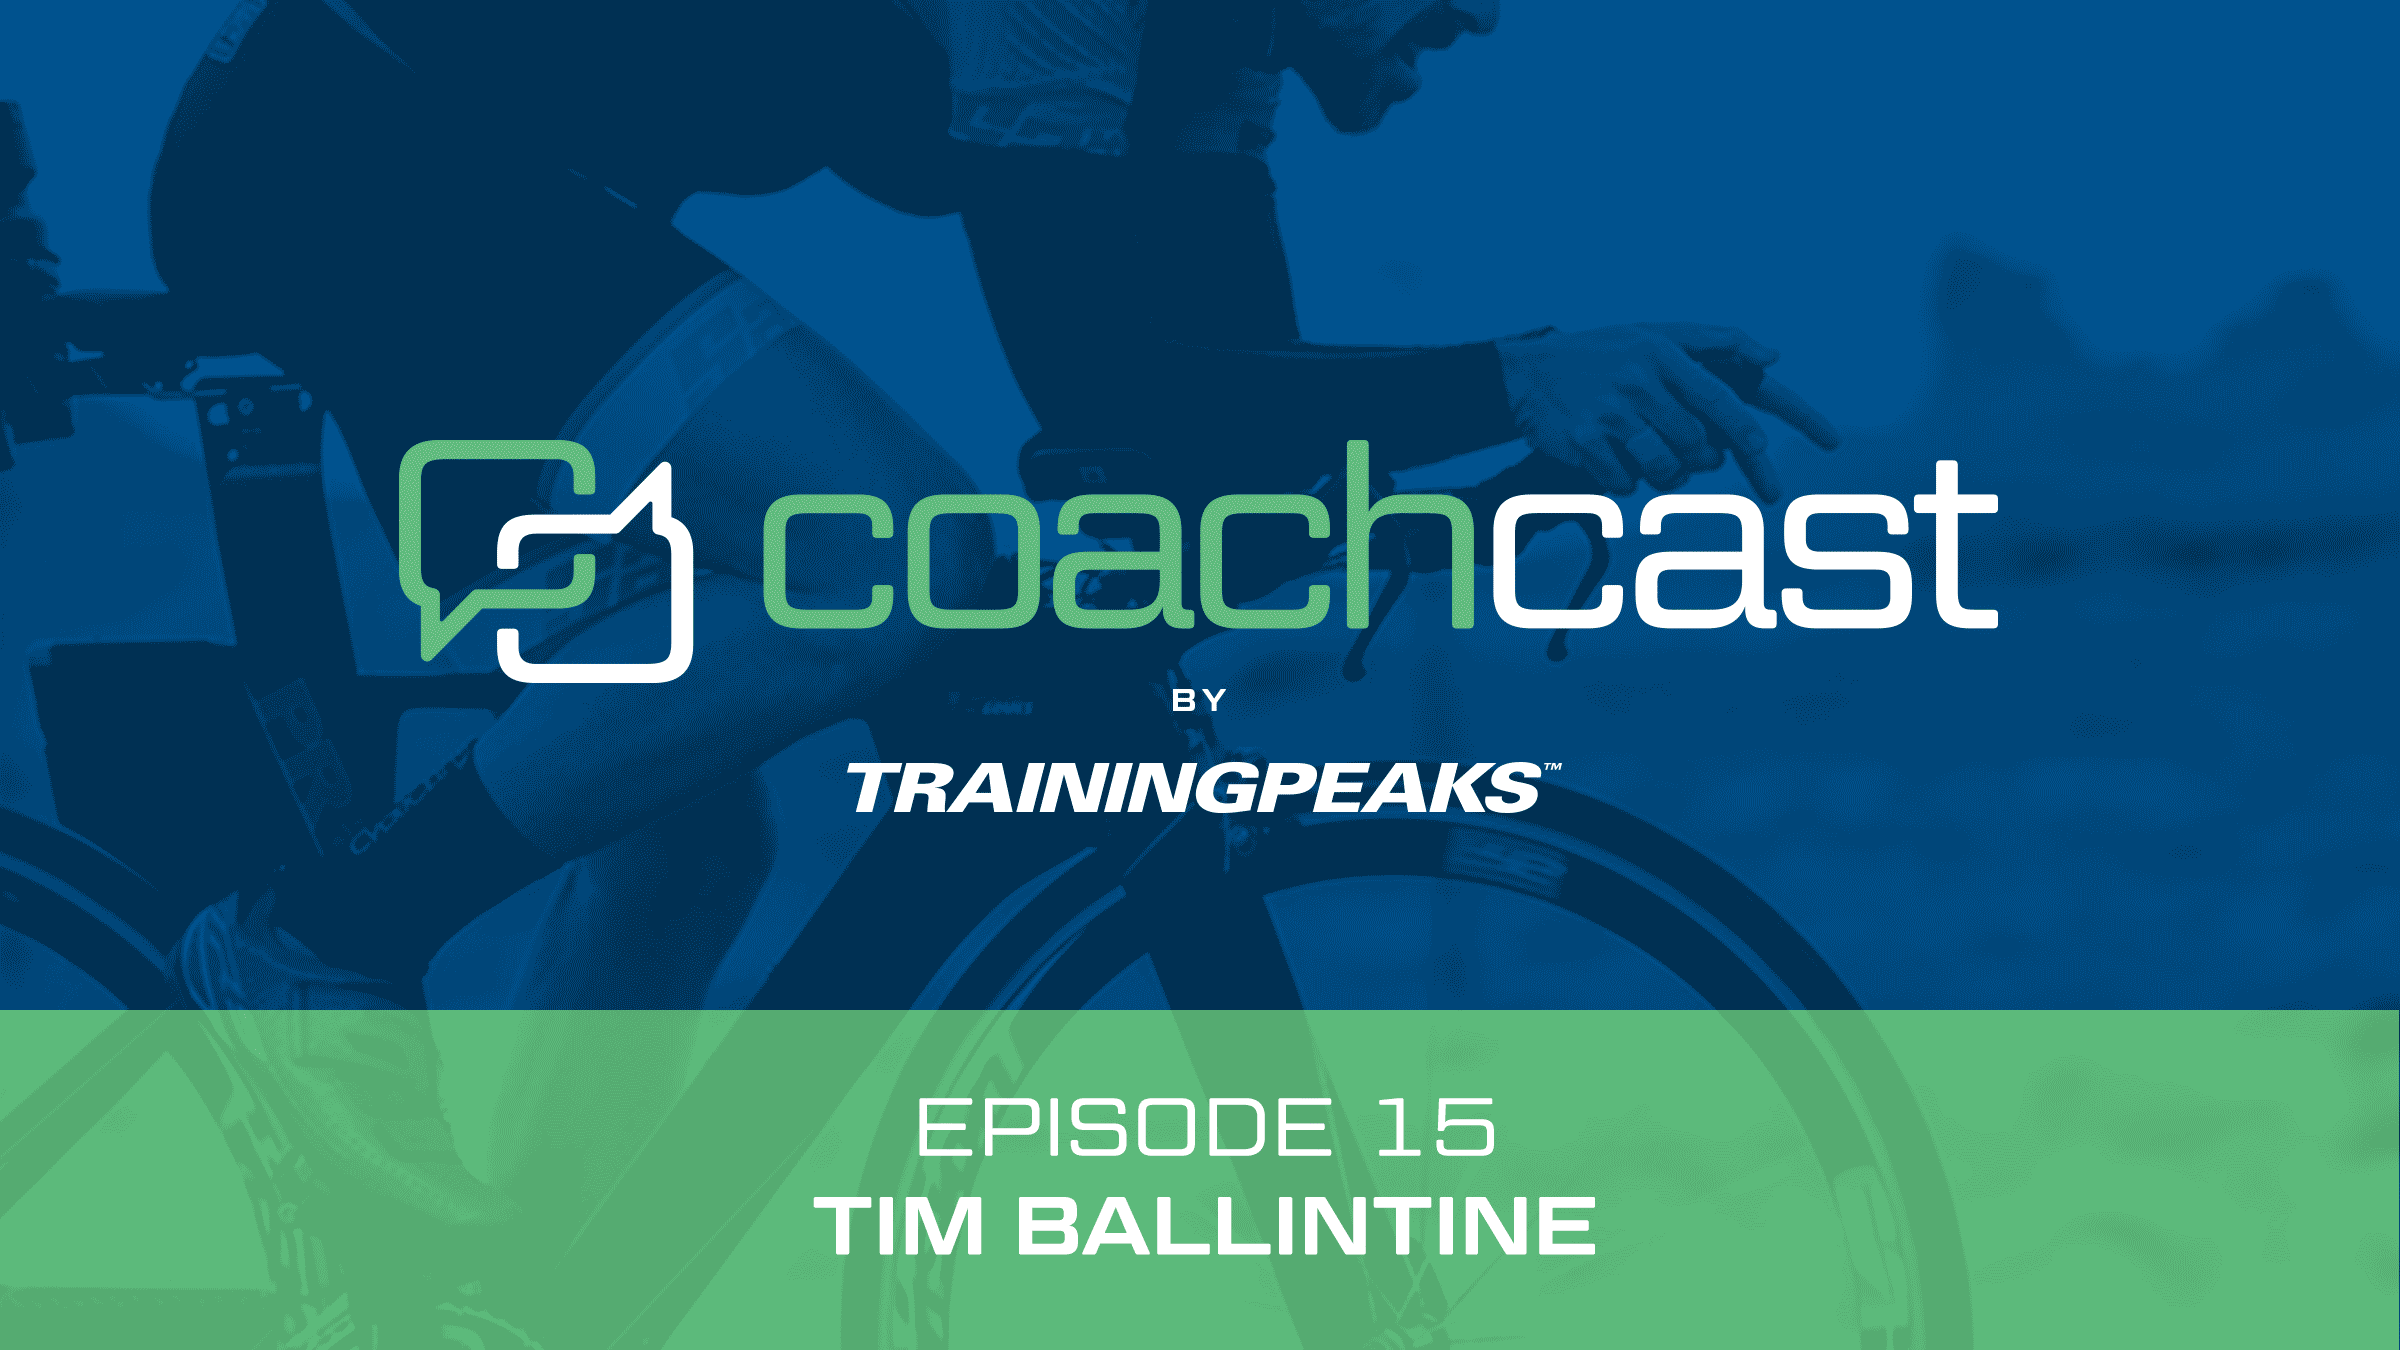 CoachCast: Efficient Coaching with Tim Ballintine